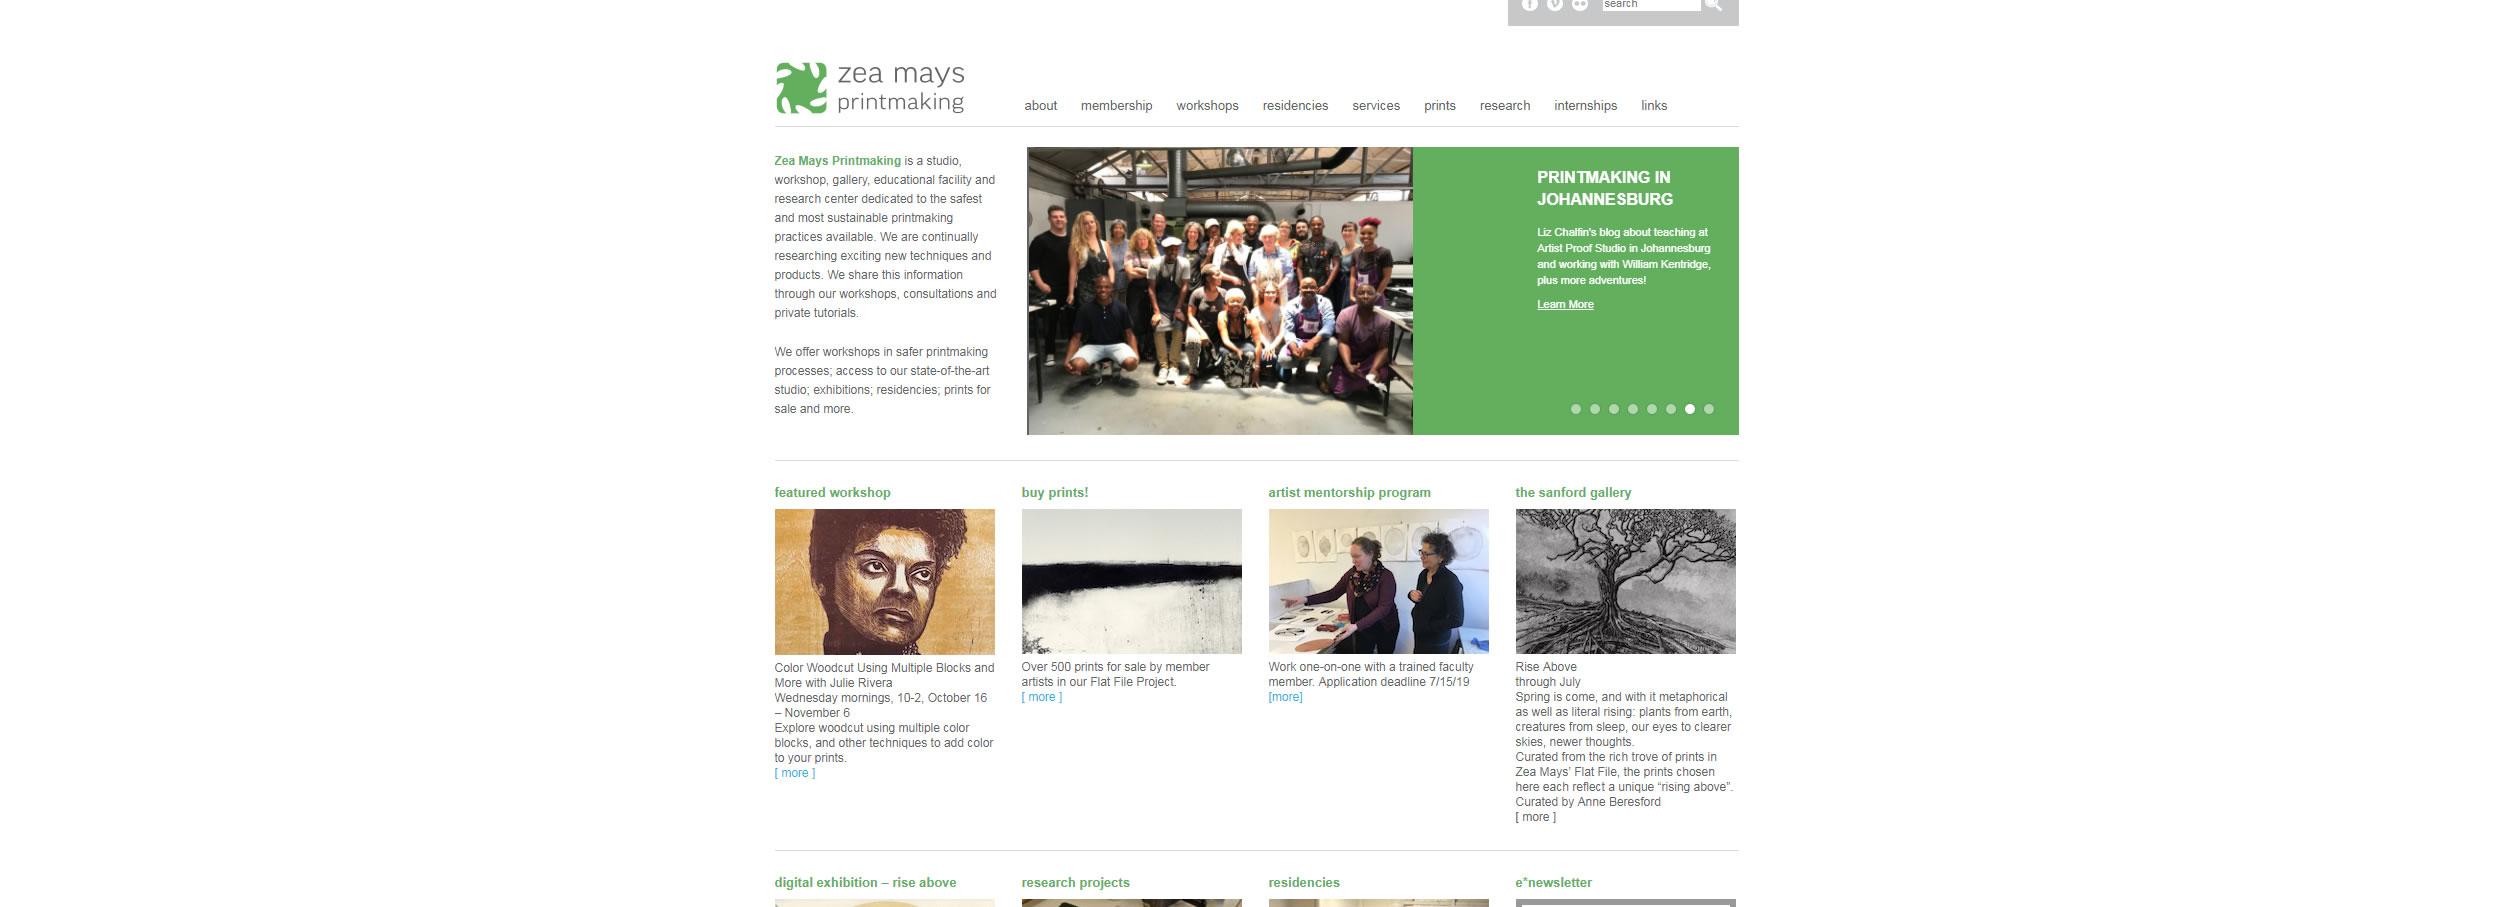 zea_mays_printmaking_galeria_de_gravura